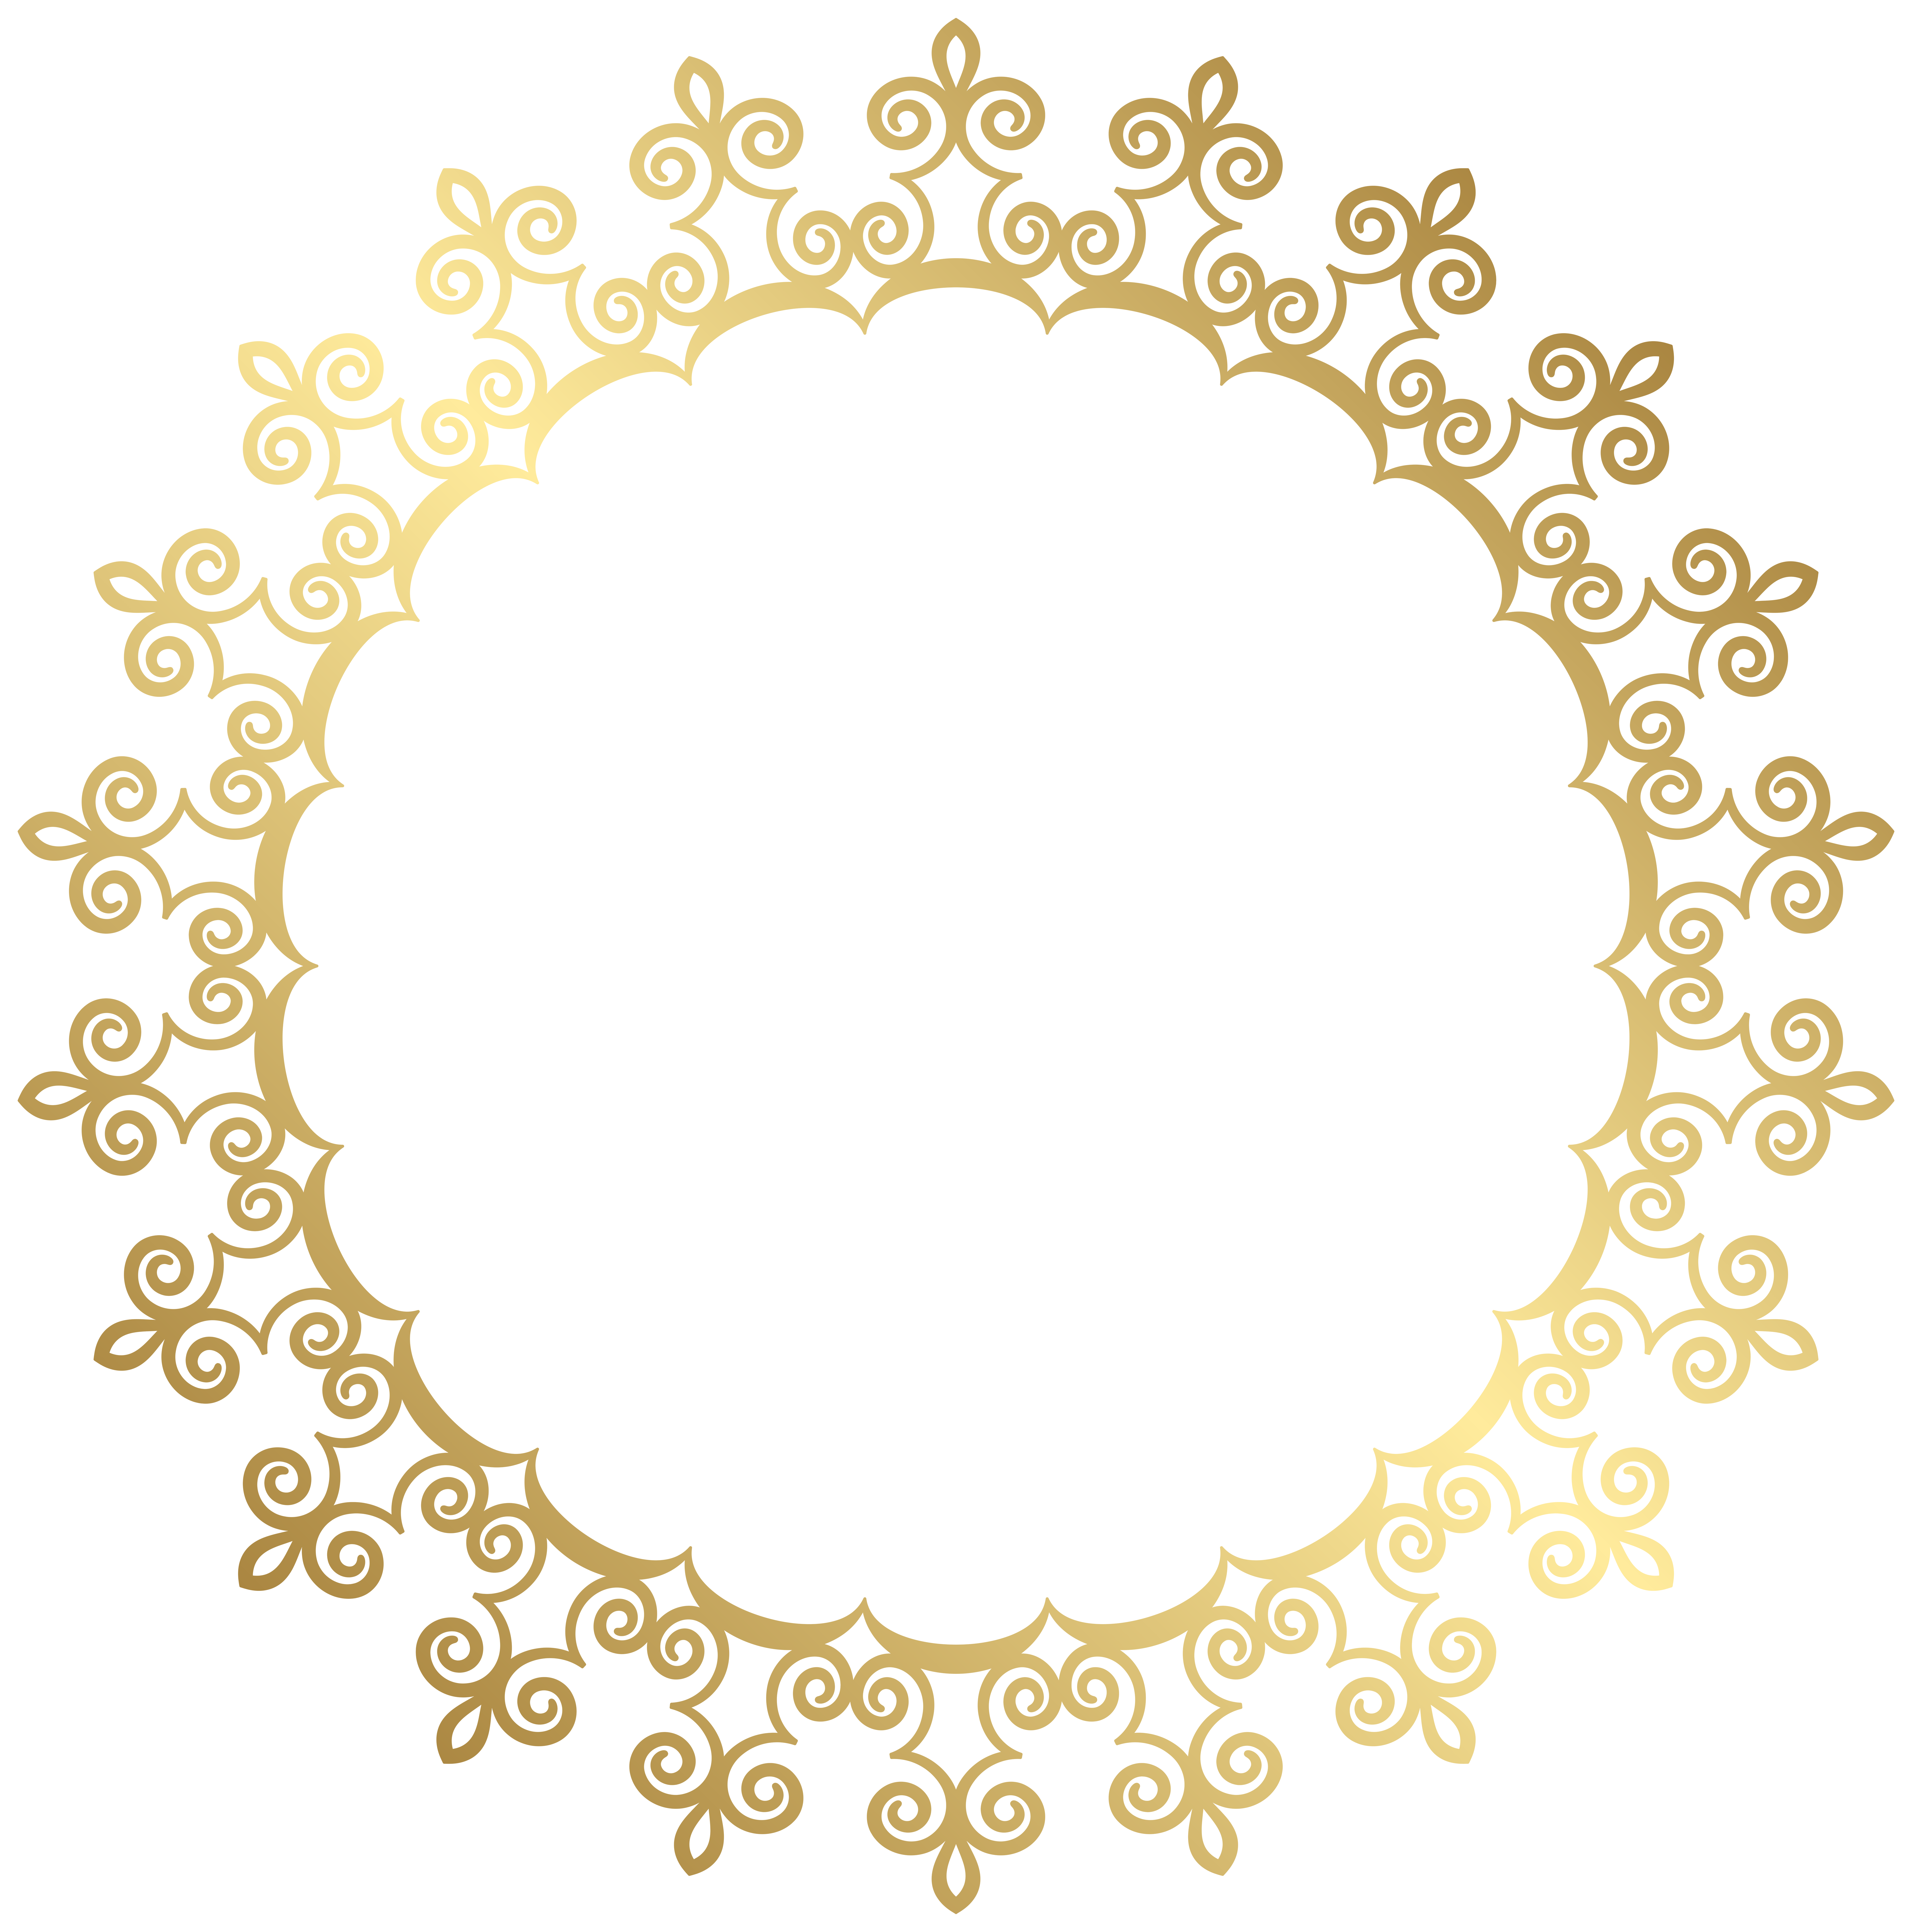 round gold border frame transparent clip art image �амки